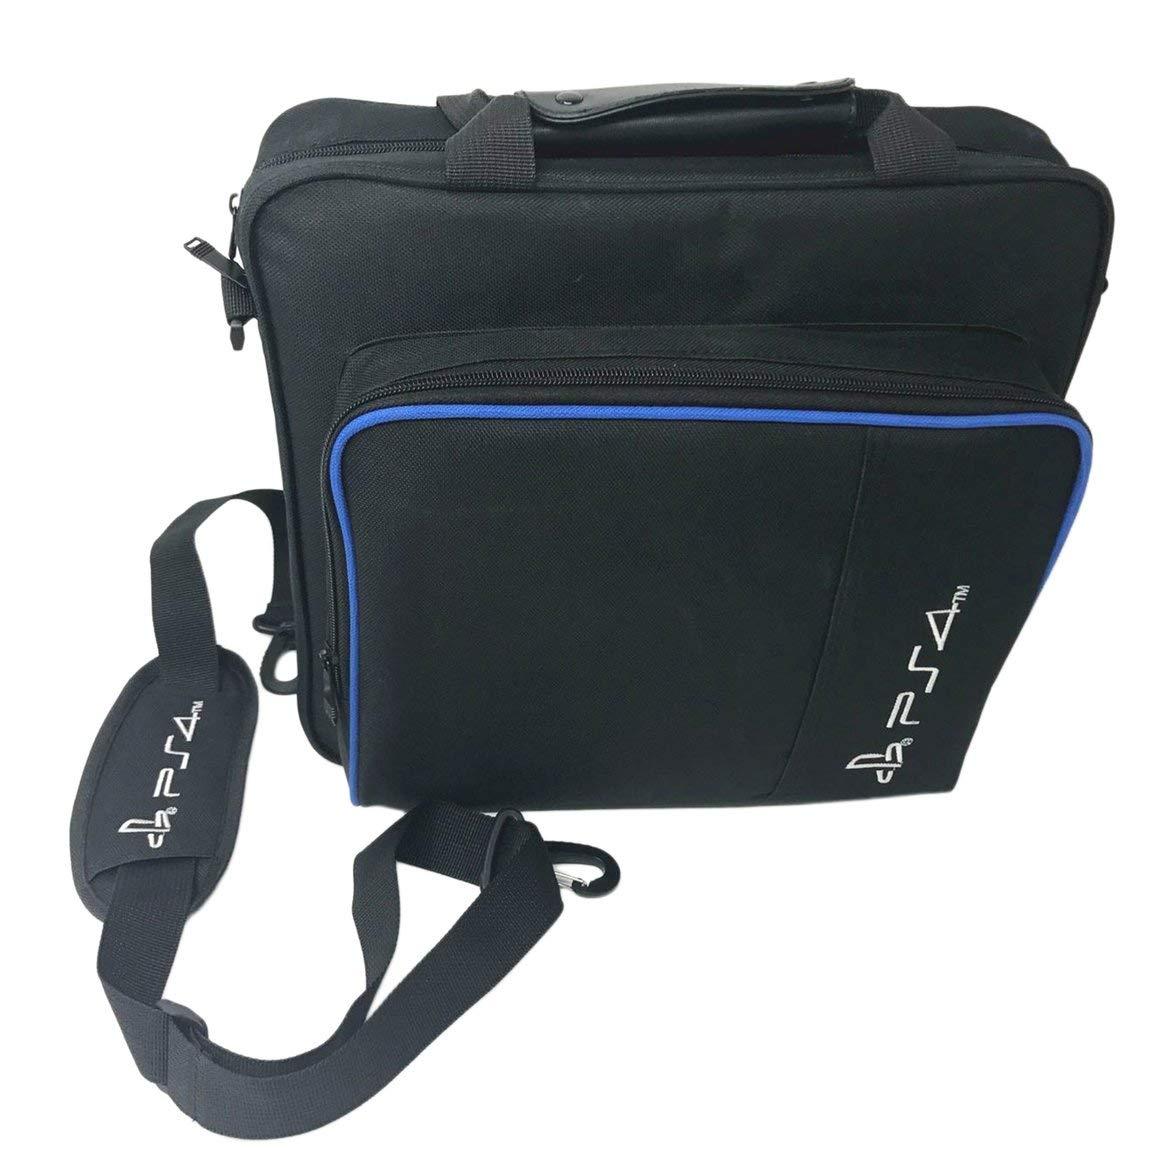 Bolsa de almacenamiento para consola de juegos Bolsa de viaje impermeable a prueba de golpes Bolso bandolera para accesorios de consola PS4 Pro Bolsa de transporte - Negro Delicacydex